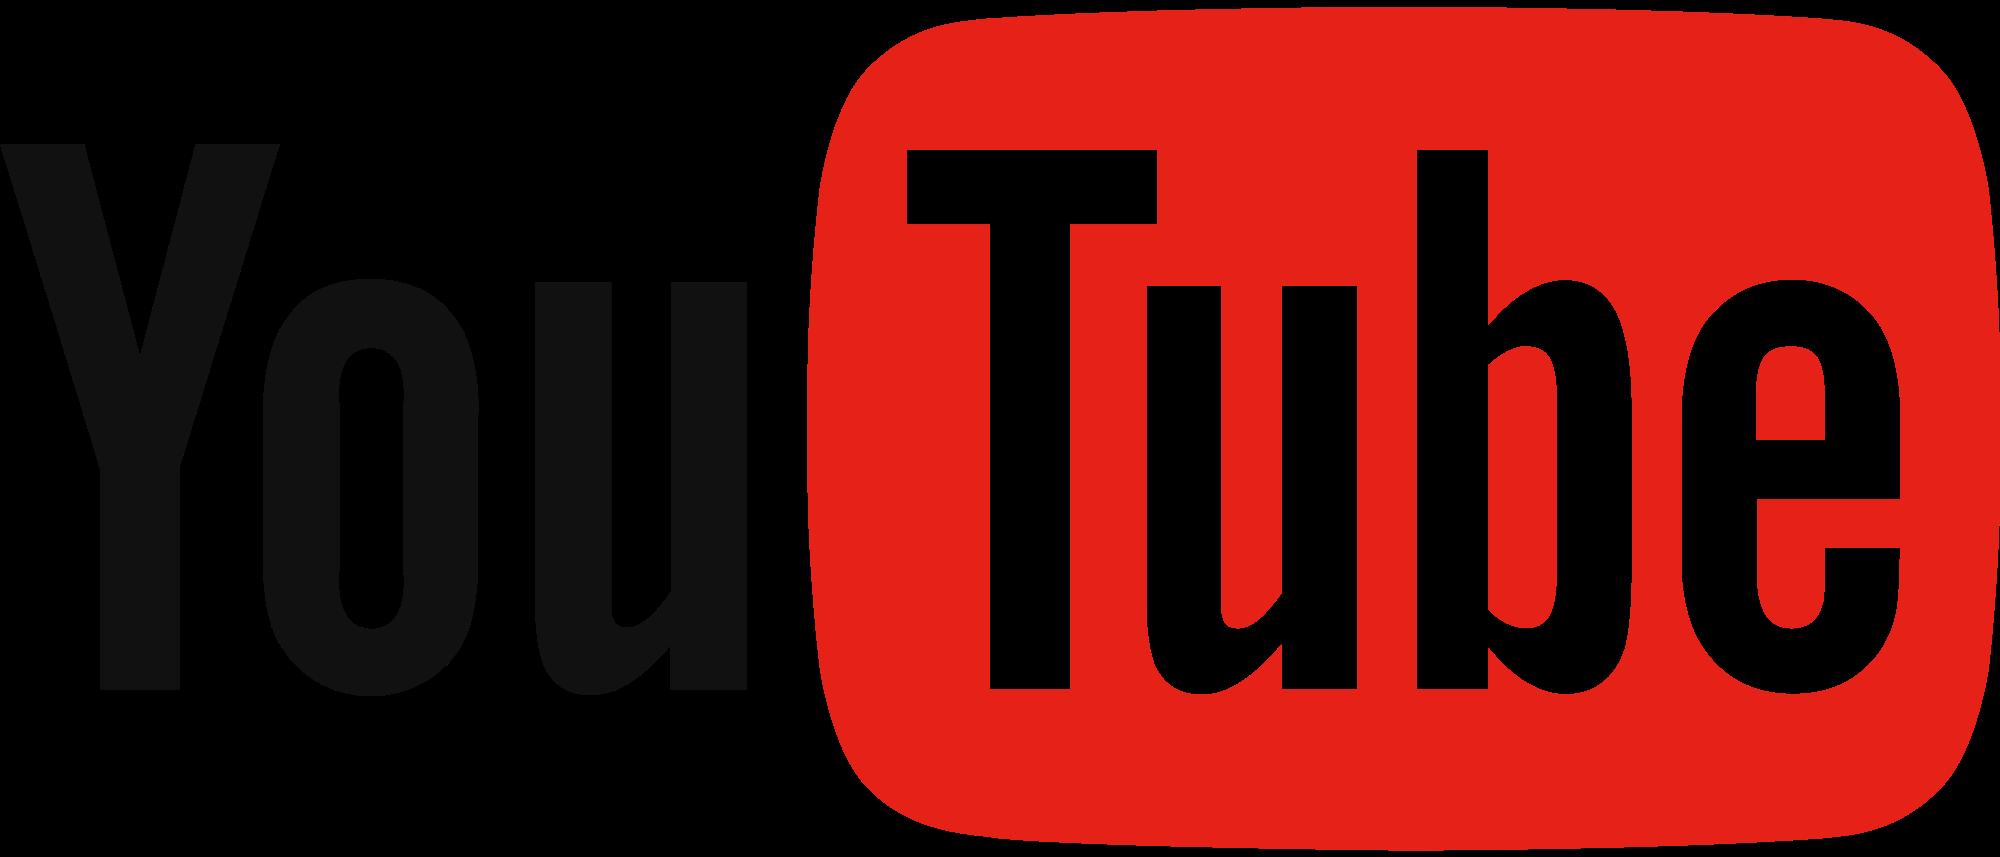 Youtube clipart maker. Unique icon vector library